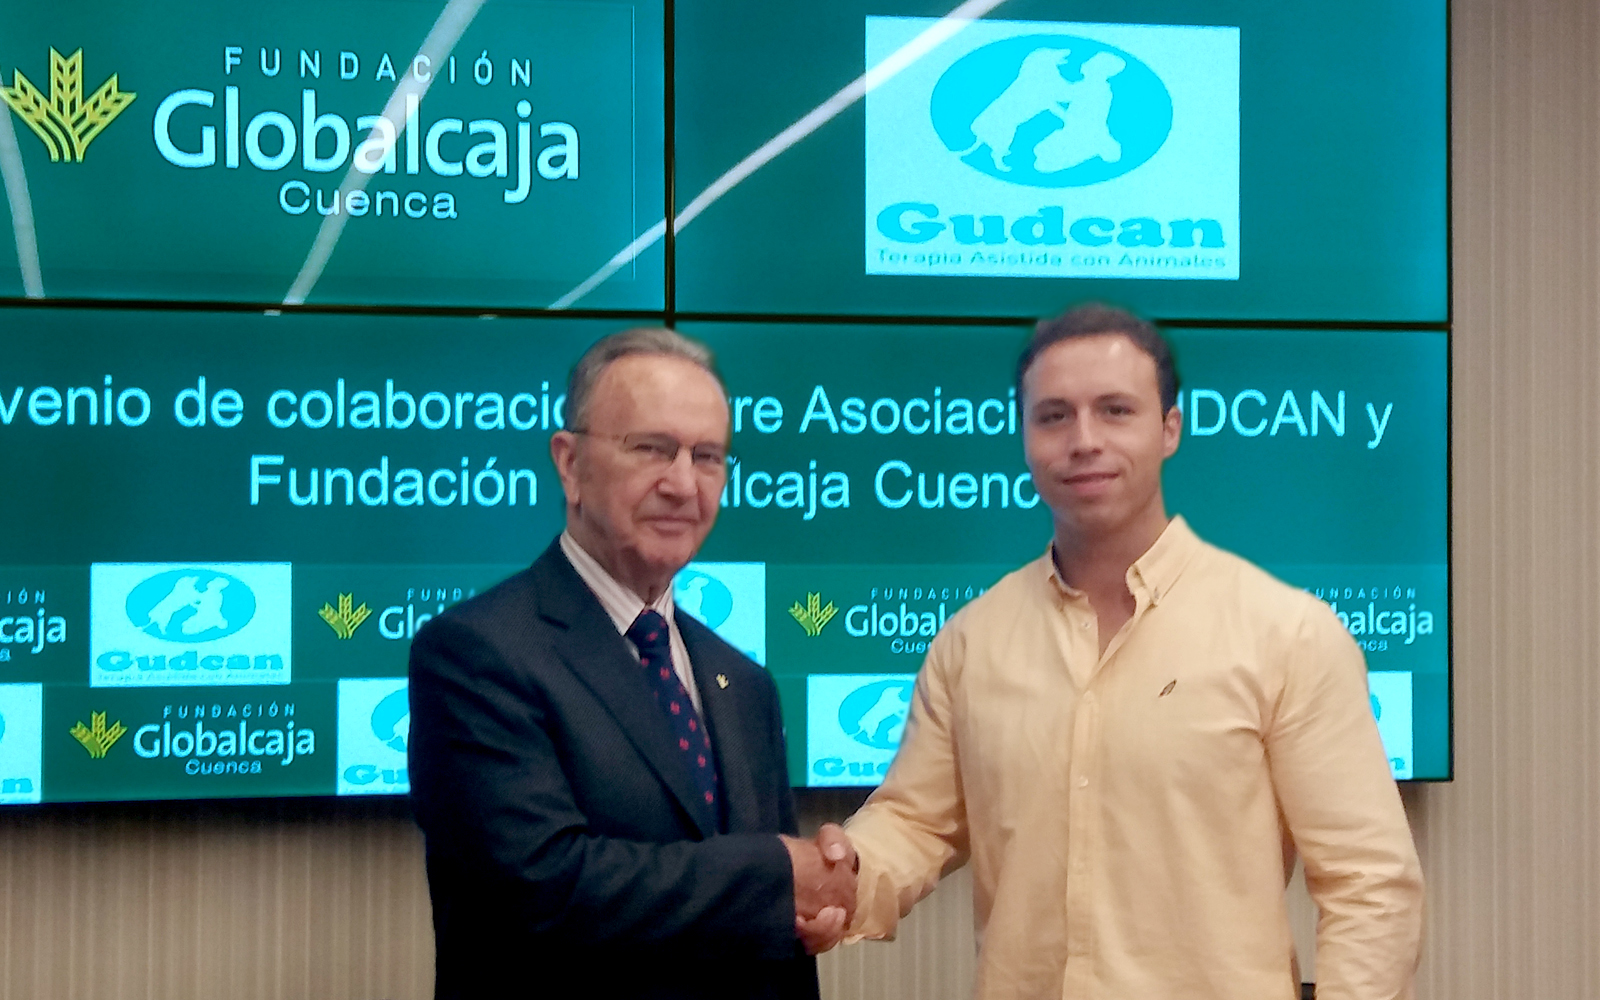 https://blog.globalcaja.es/wp-content/uploads/2018/06/20180608_102638_firma-convenio.jpg